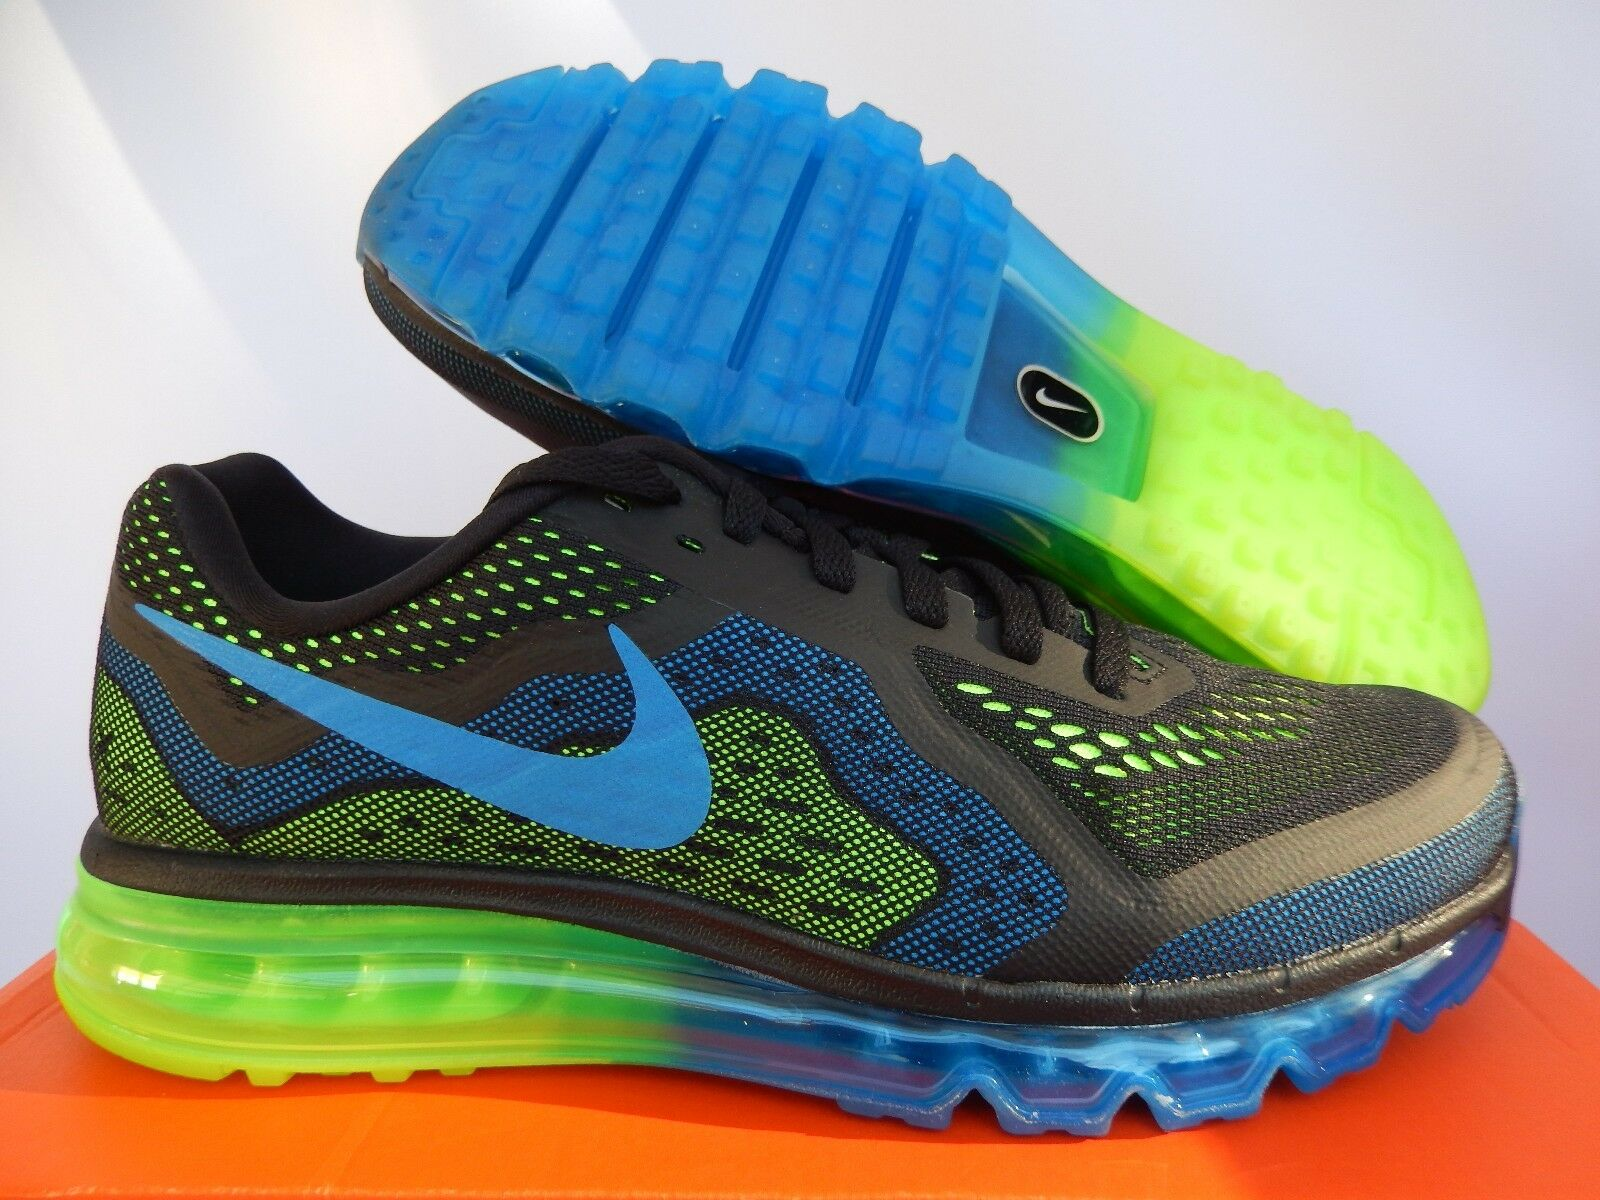 sports shoes 110f2 06e7e NIKE AIR MAX 2014 BLACK-PHOTO BLUE-ELECTRIC GREEN-LIME SZ 10